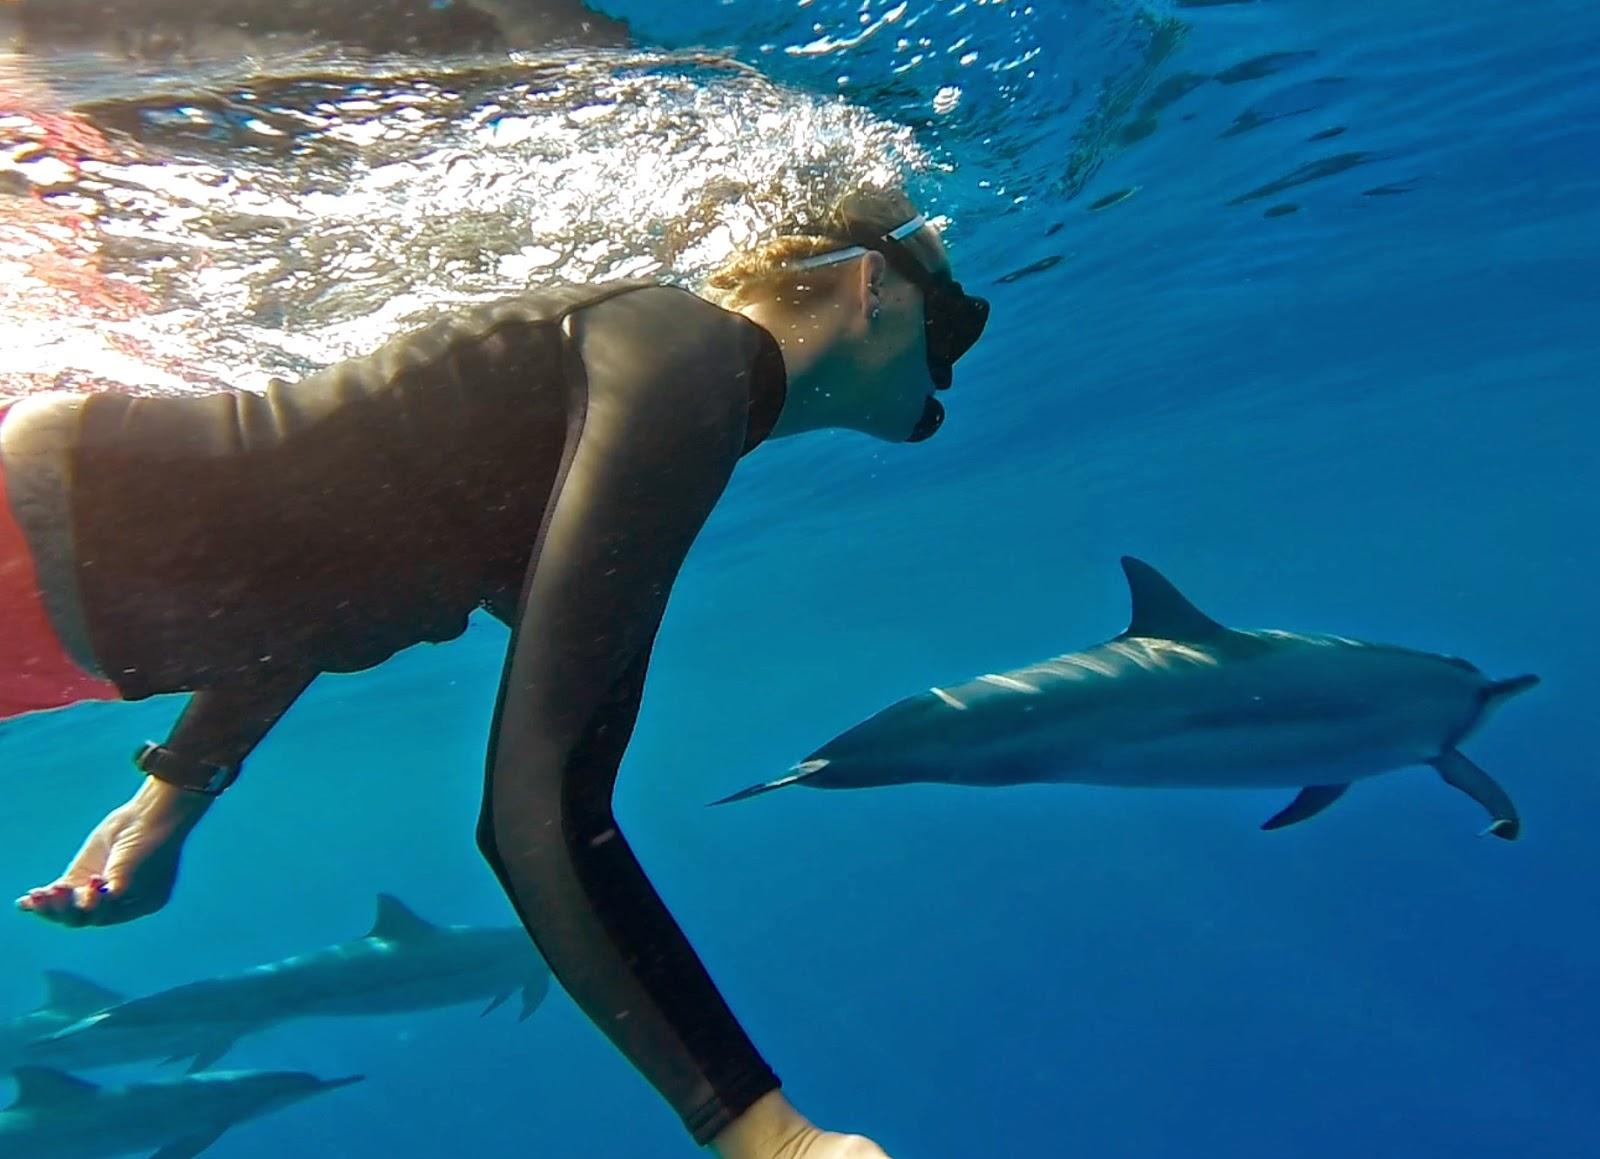 Swim with dolphins in Kona, on the Big Island of Hawaii